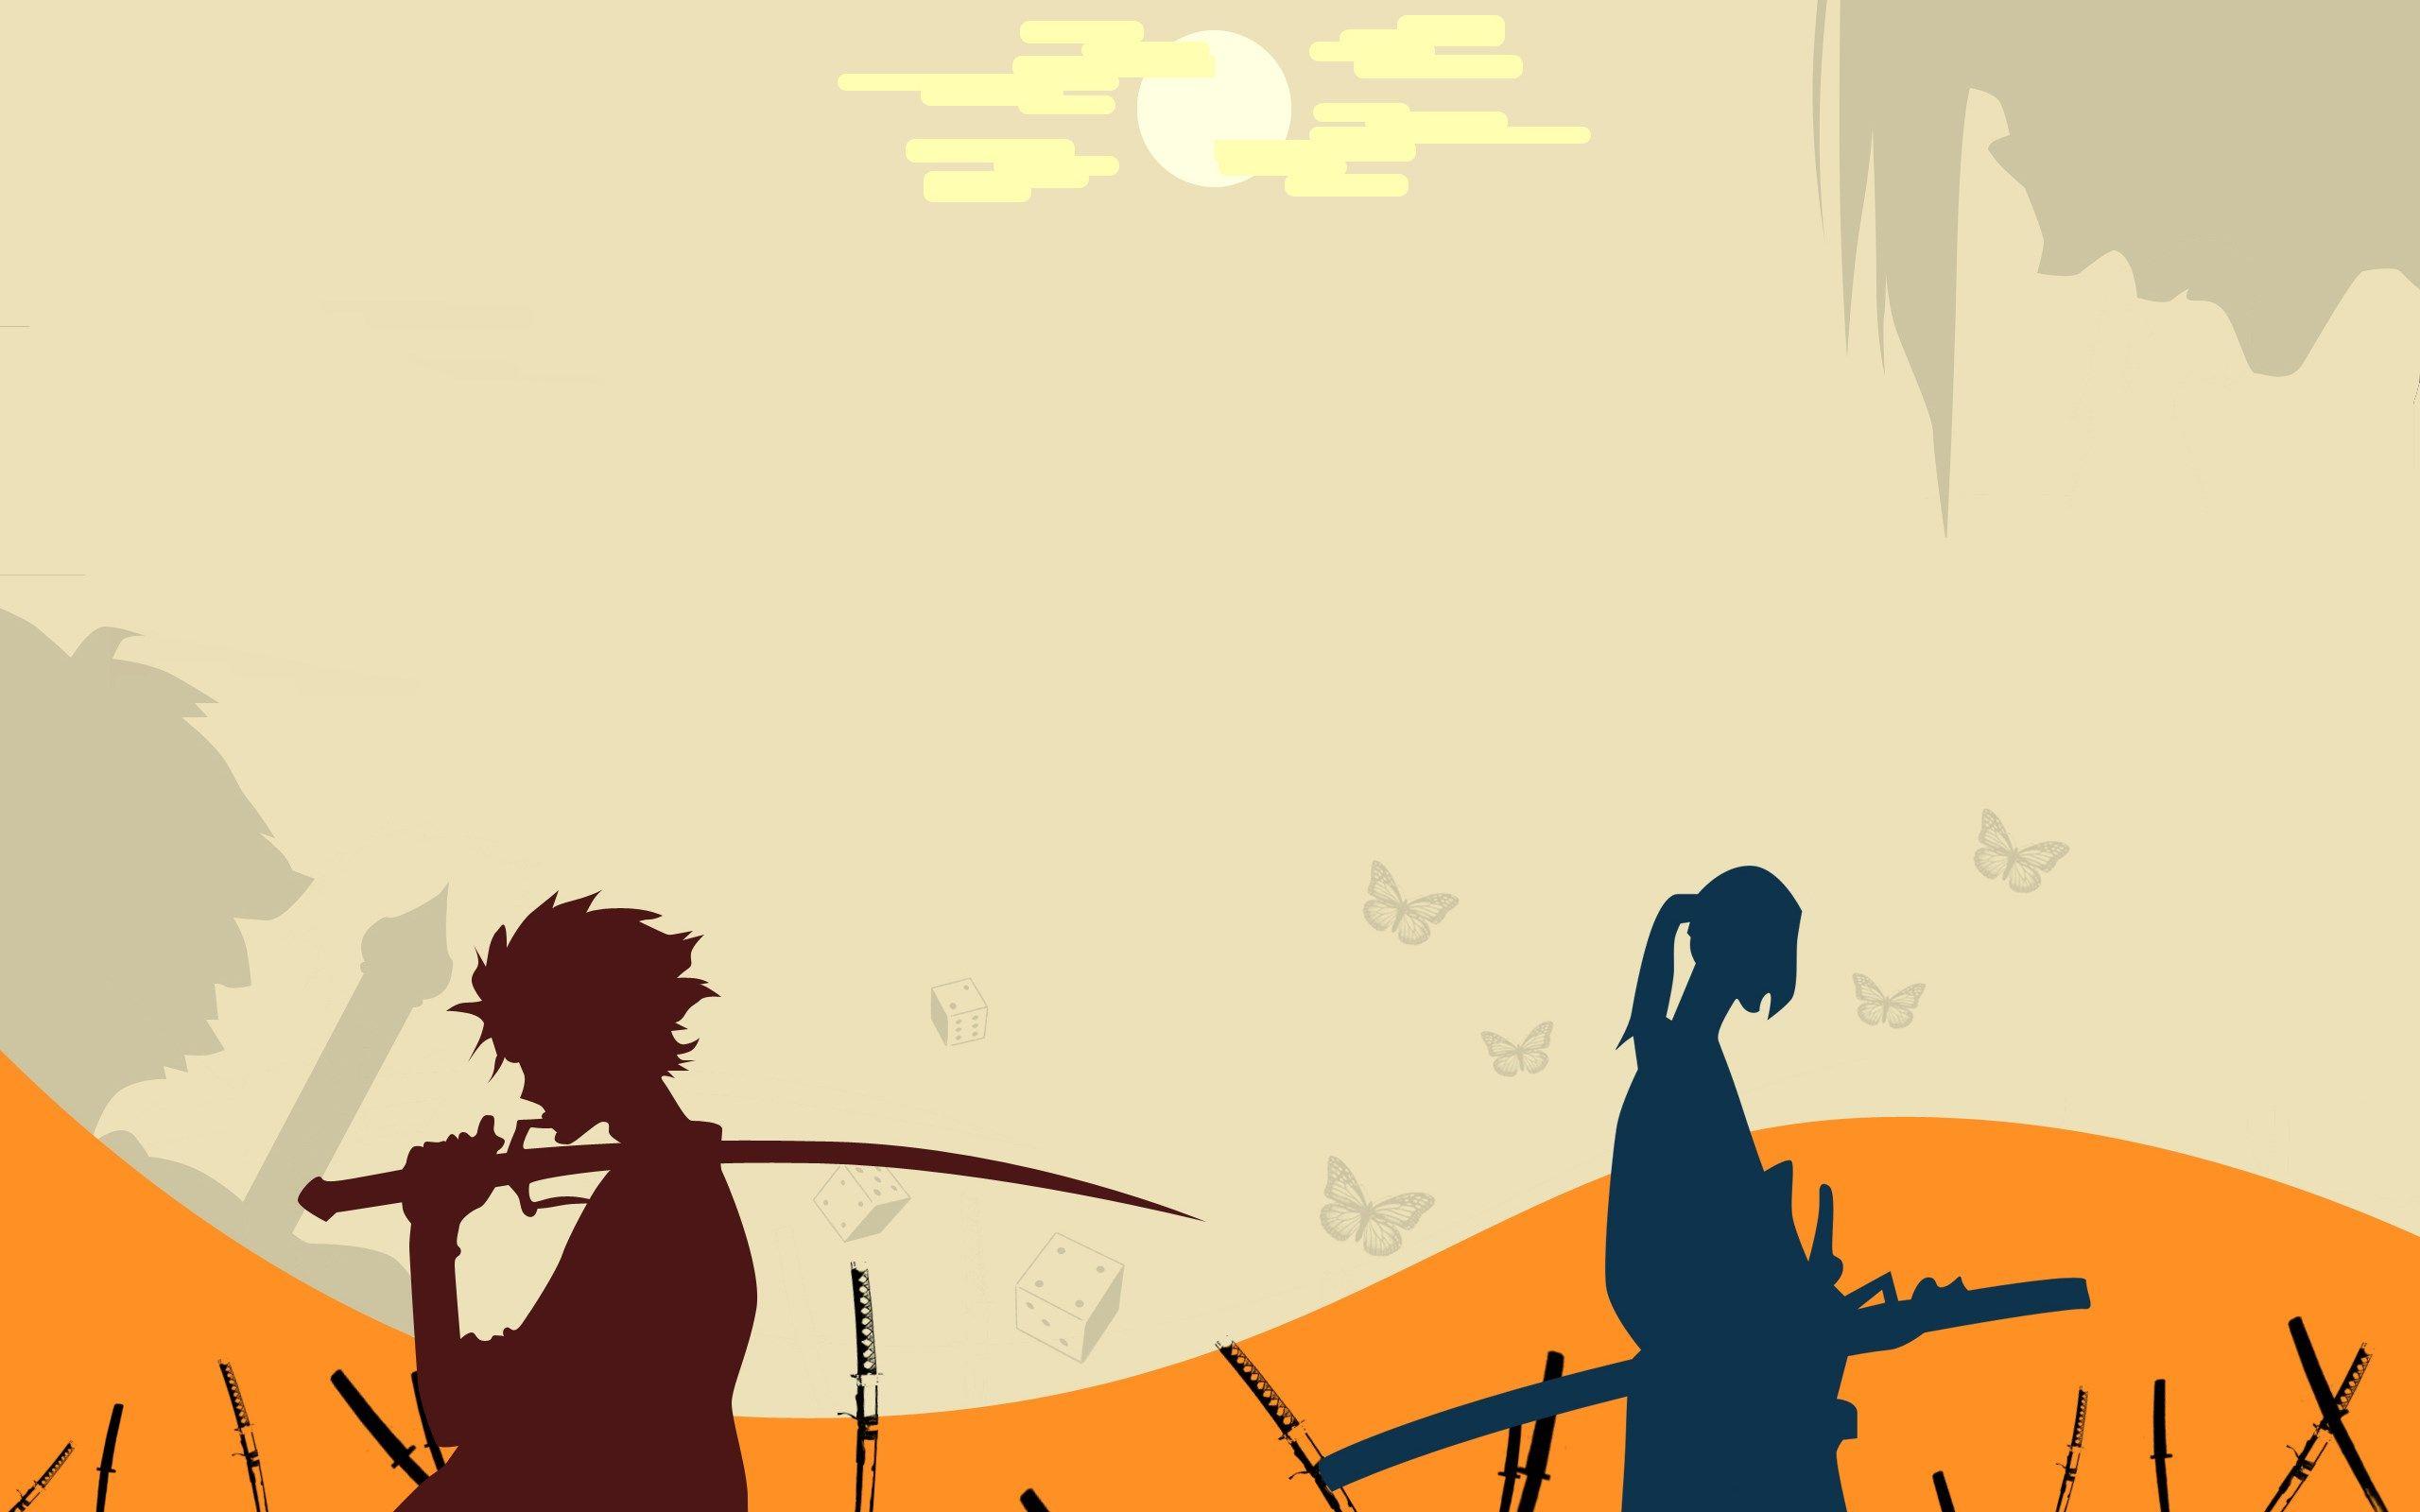 Samurai Champloo Desktop Nexus Wallpaper Samurai Champloo Anime Wallpaper Samurai Anime